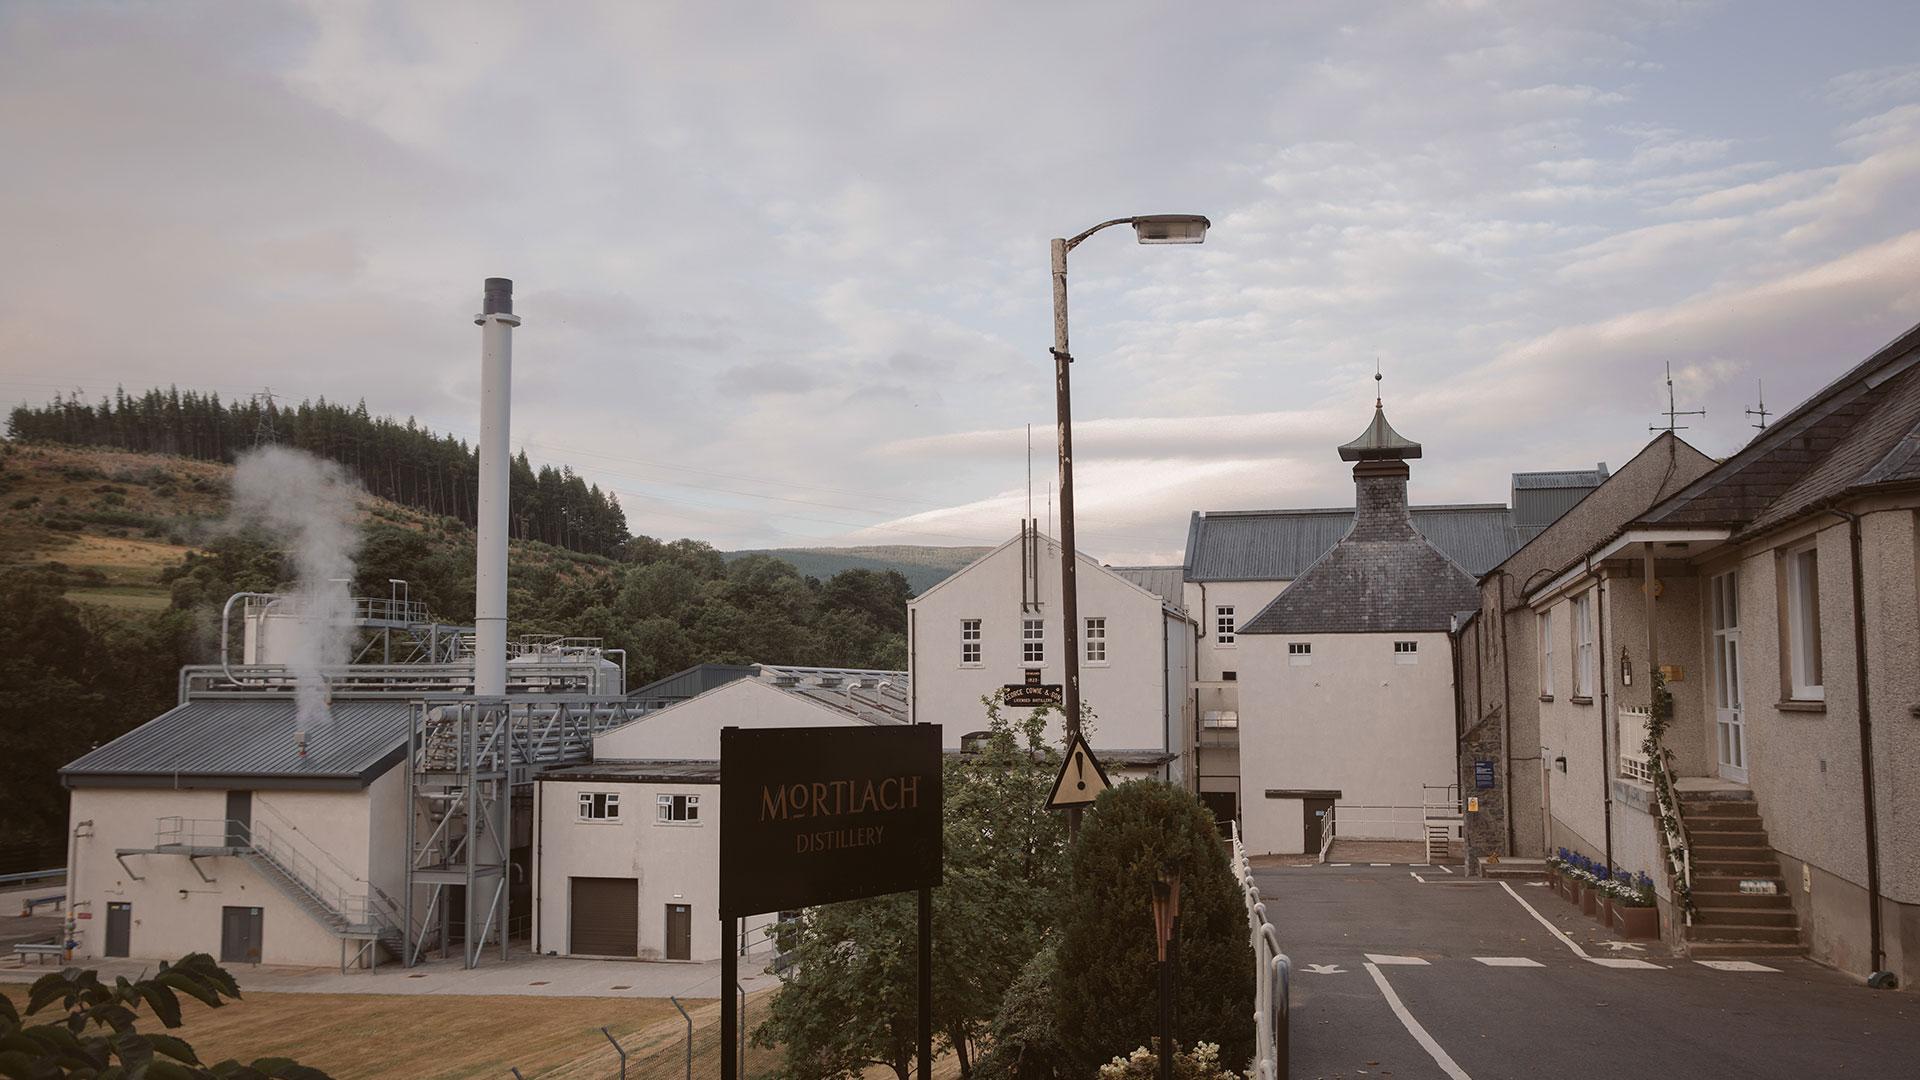 The Mortlach distillery in Dufftown, Speyside